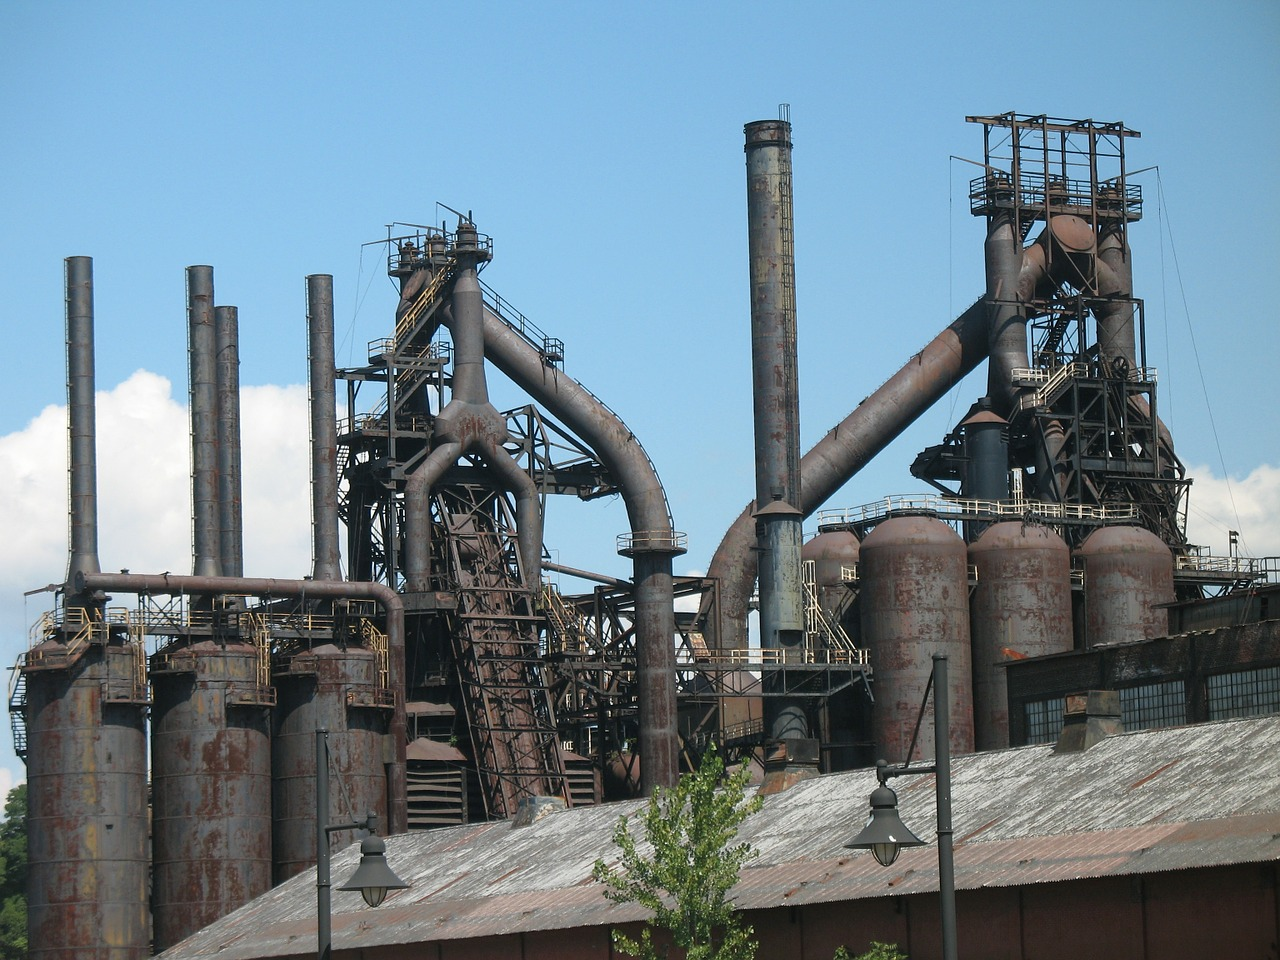 factory-265668_1280